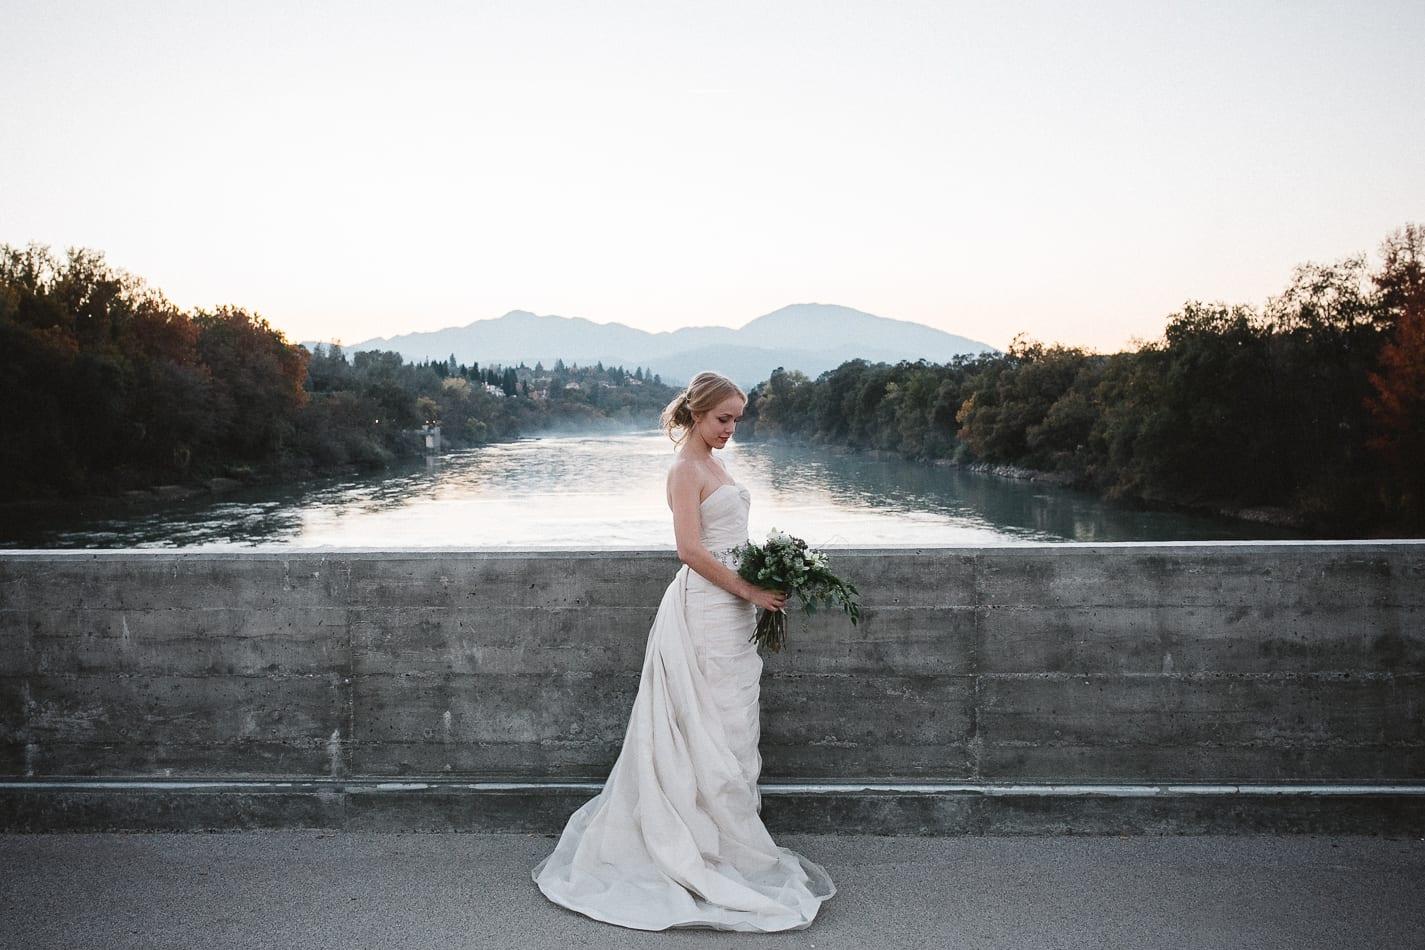 lake-redding-park-diesel-horse-bridge-view202-california-wedding-photographer-12